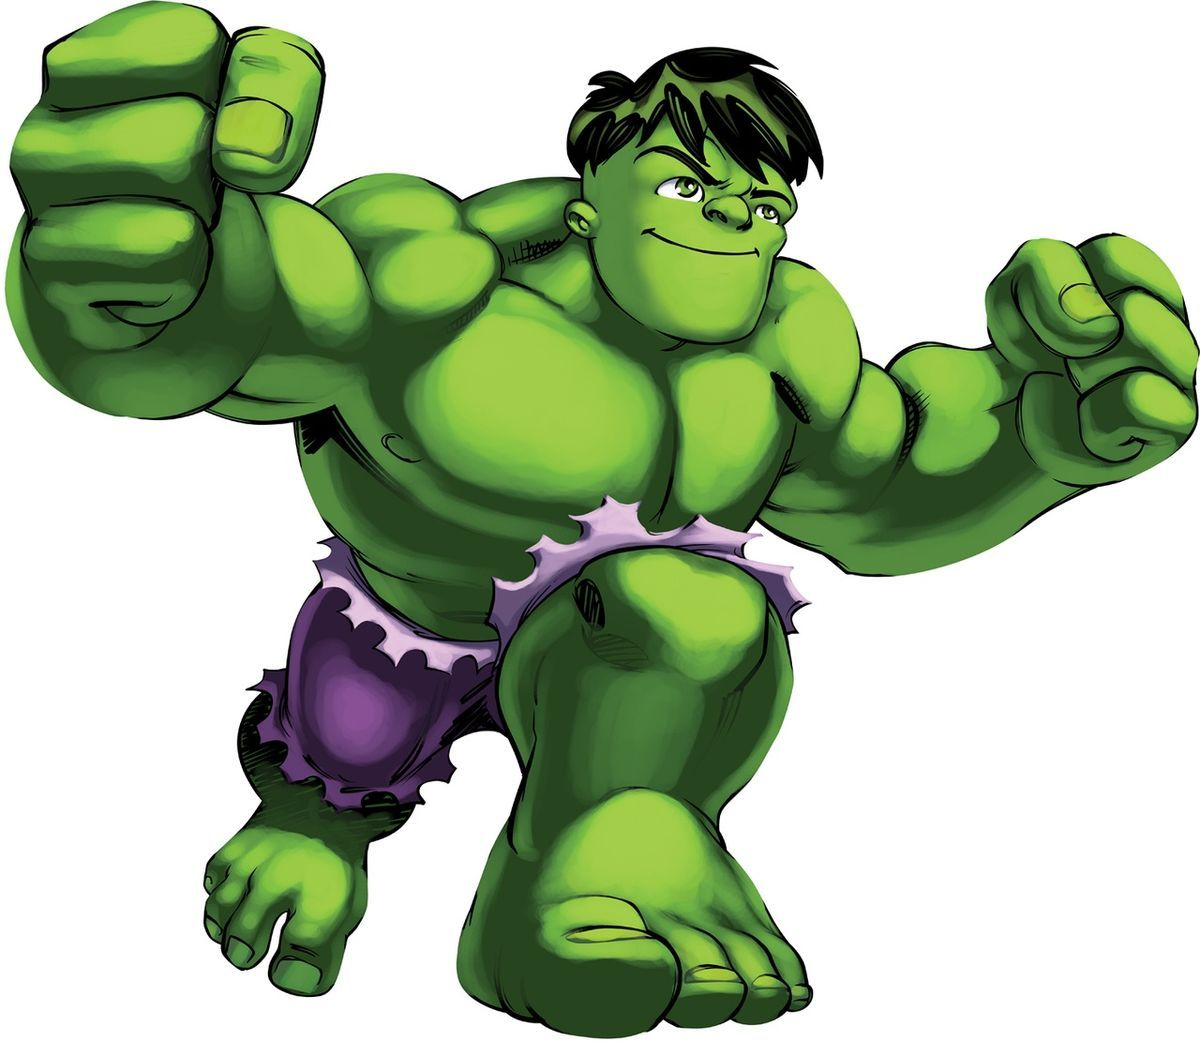 Dibujos Del Increible Hulk Para Colorear E Imprimir